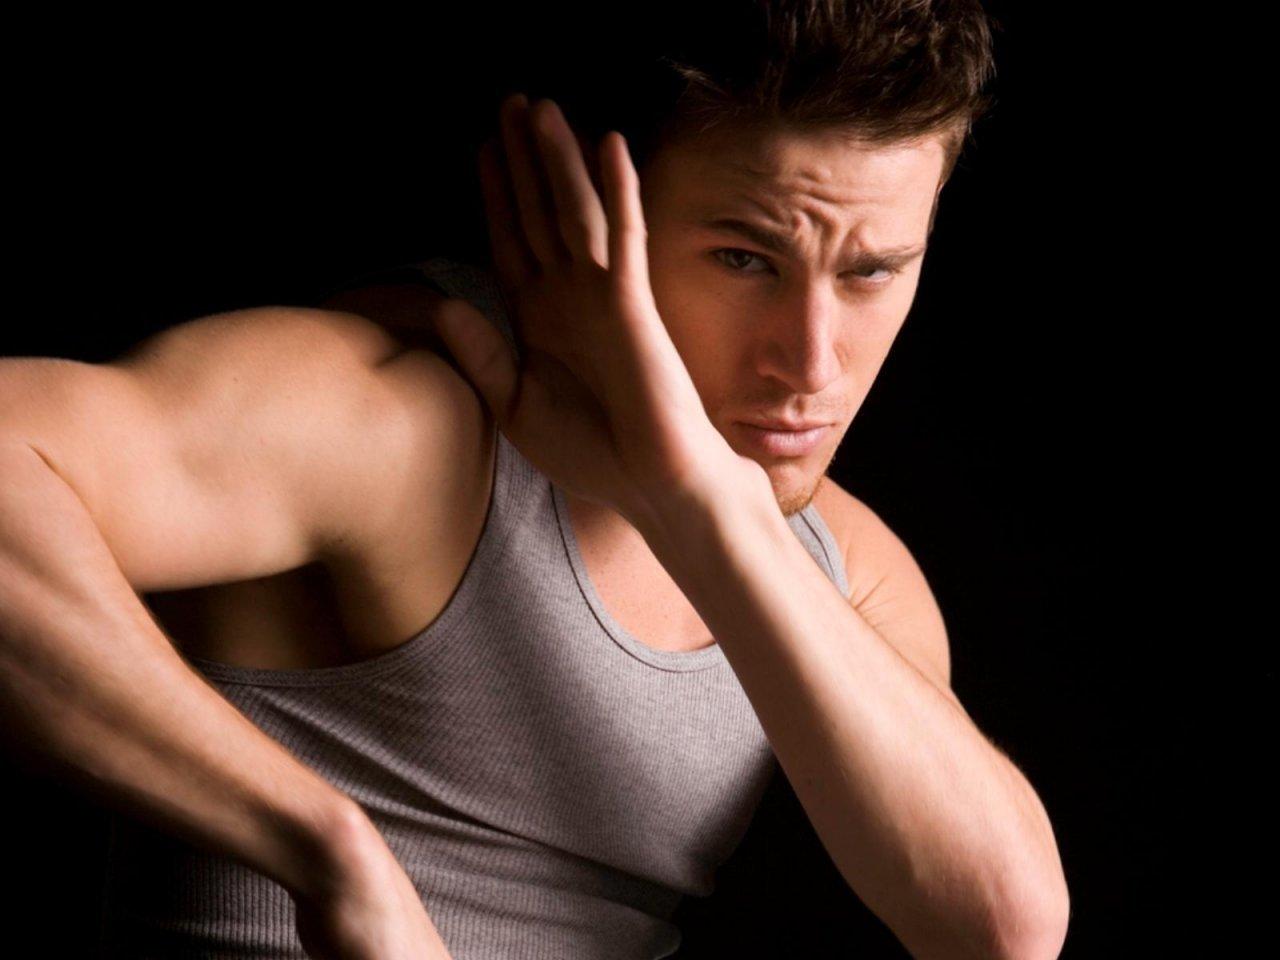 http://4.bp.blogspot.com/-sNEDv27psEY/UJIZSILoKiI/AAAAAAAAFUM/7wjoDxig4ps/s1600/Channing+Tatum_4.jpg